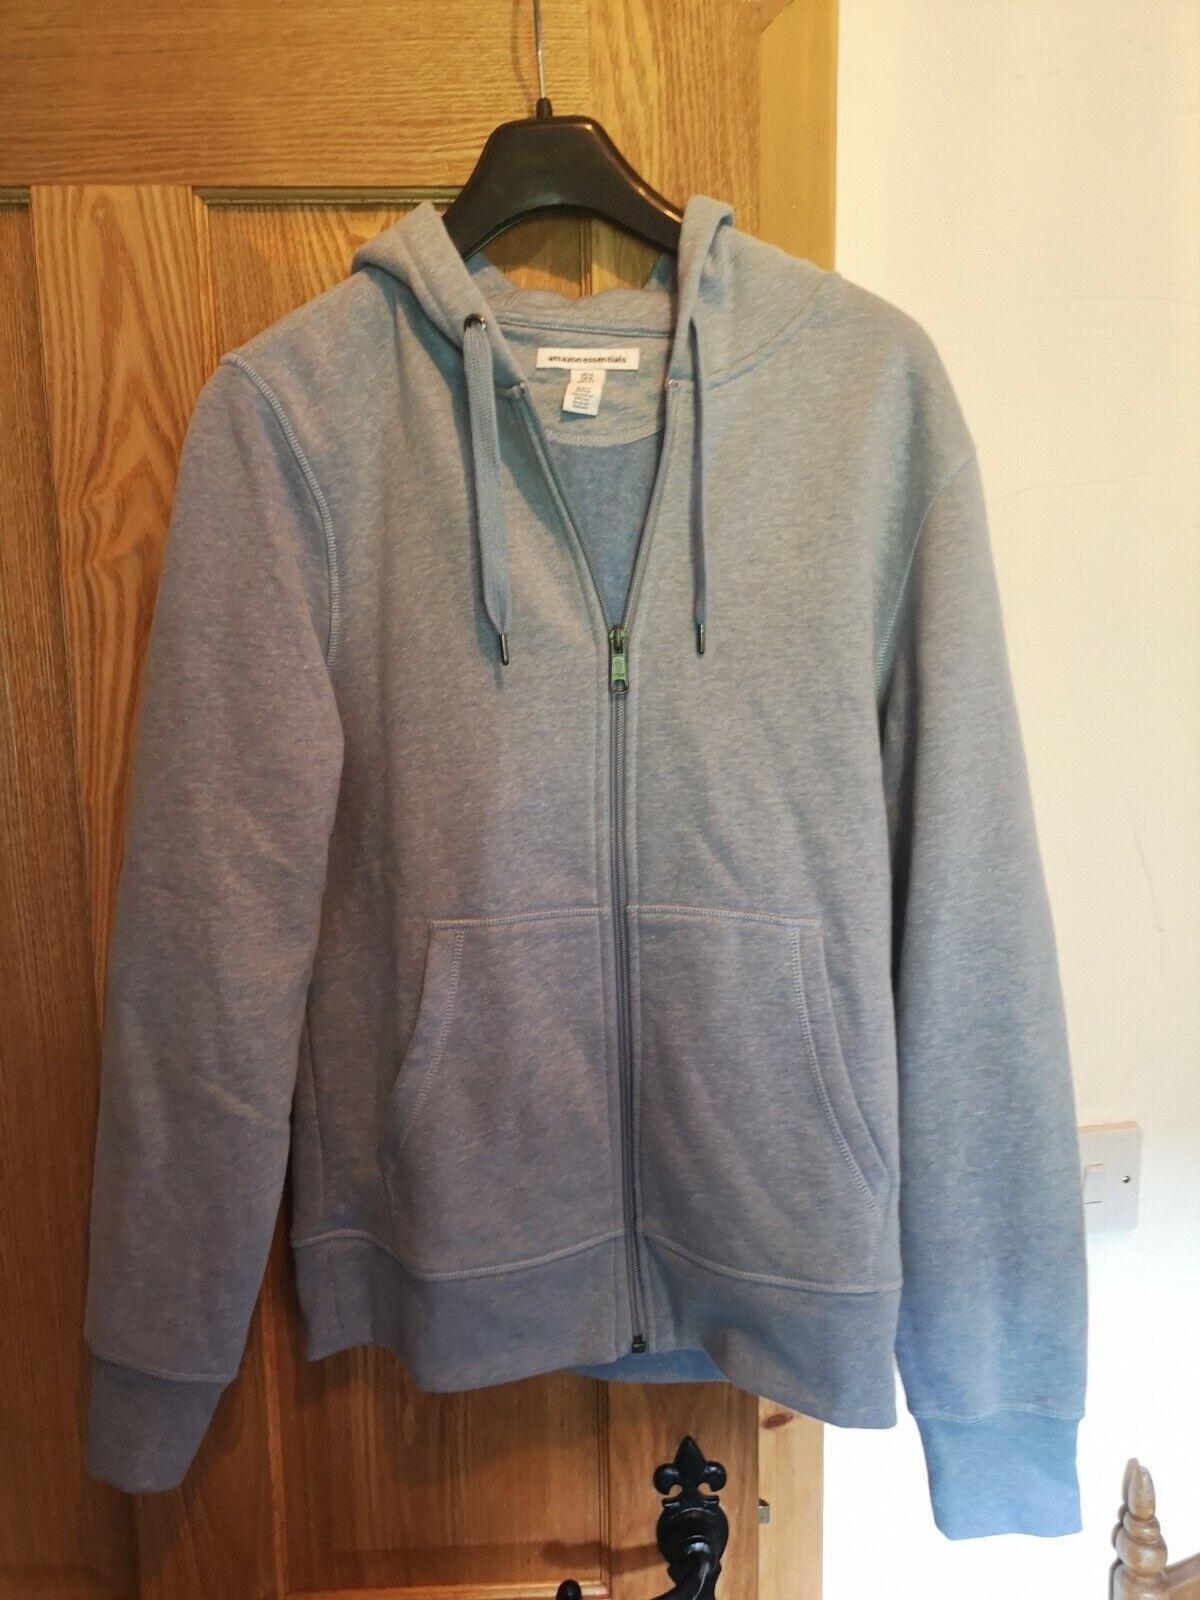 Amazon Essentials Men's Full Zip Hooded Top hoodie Size XS SMALL BLUE RRP